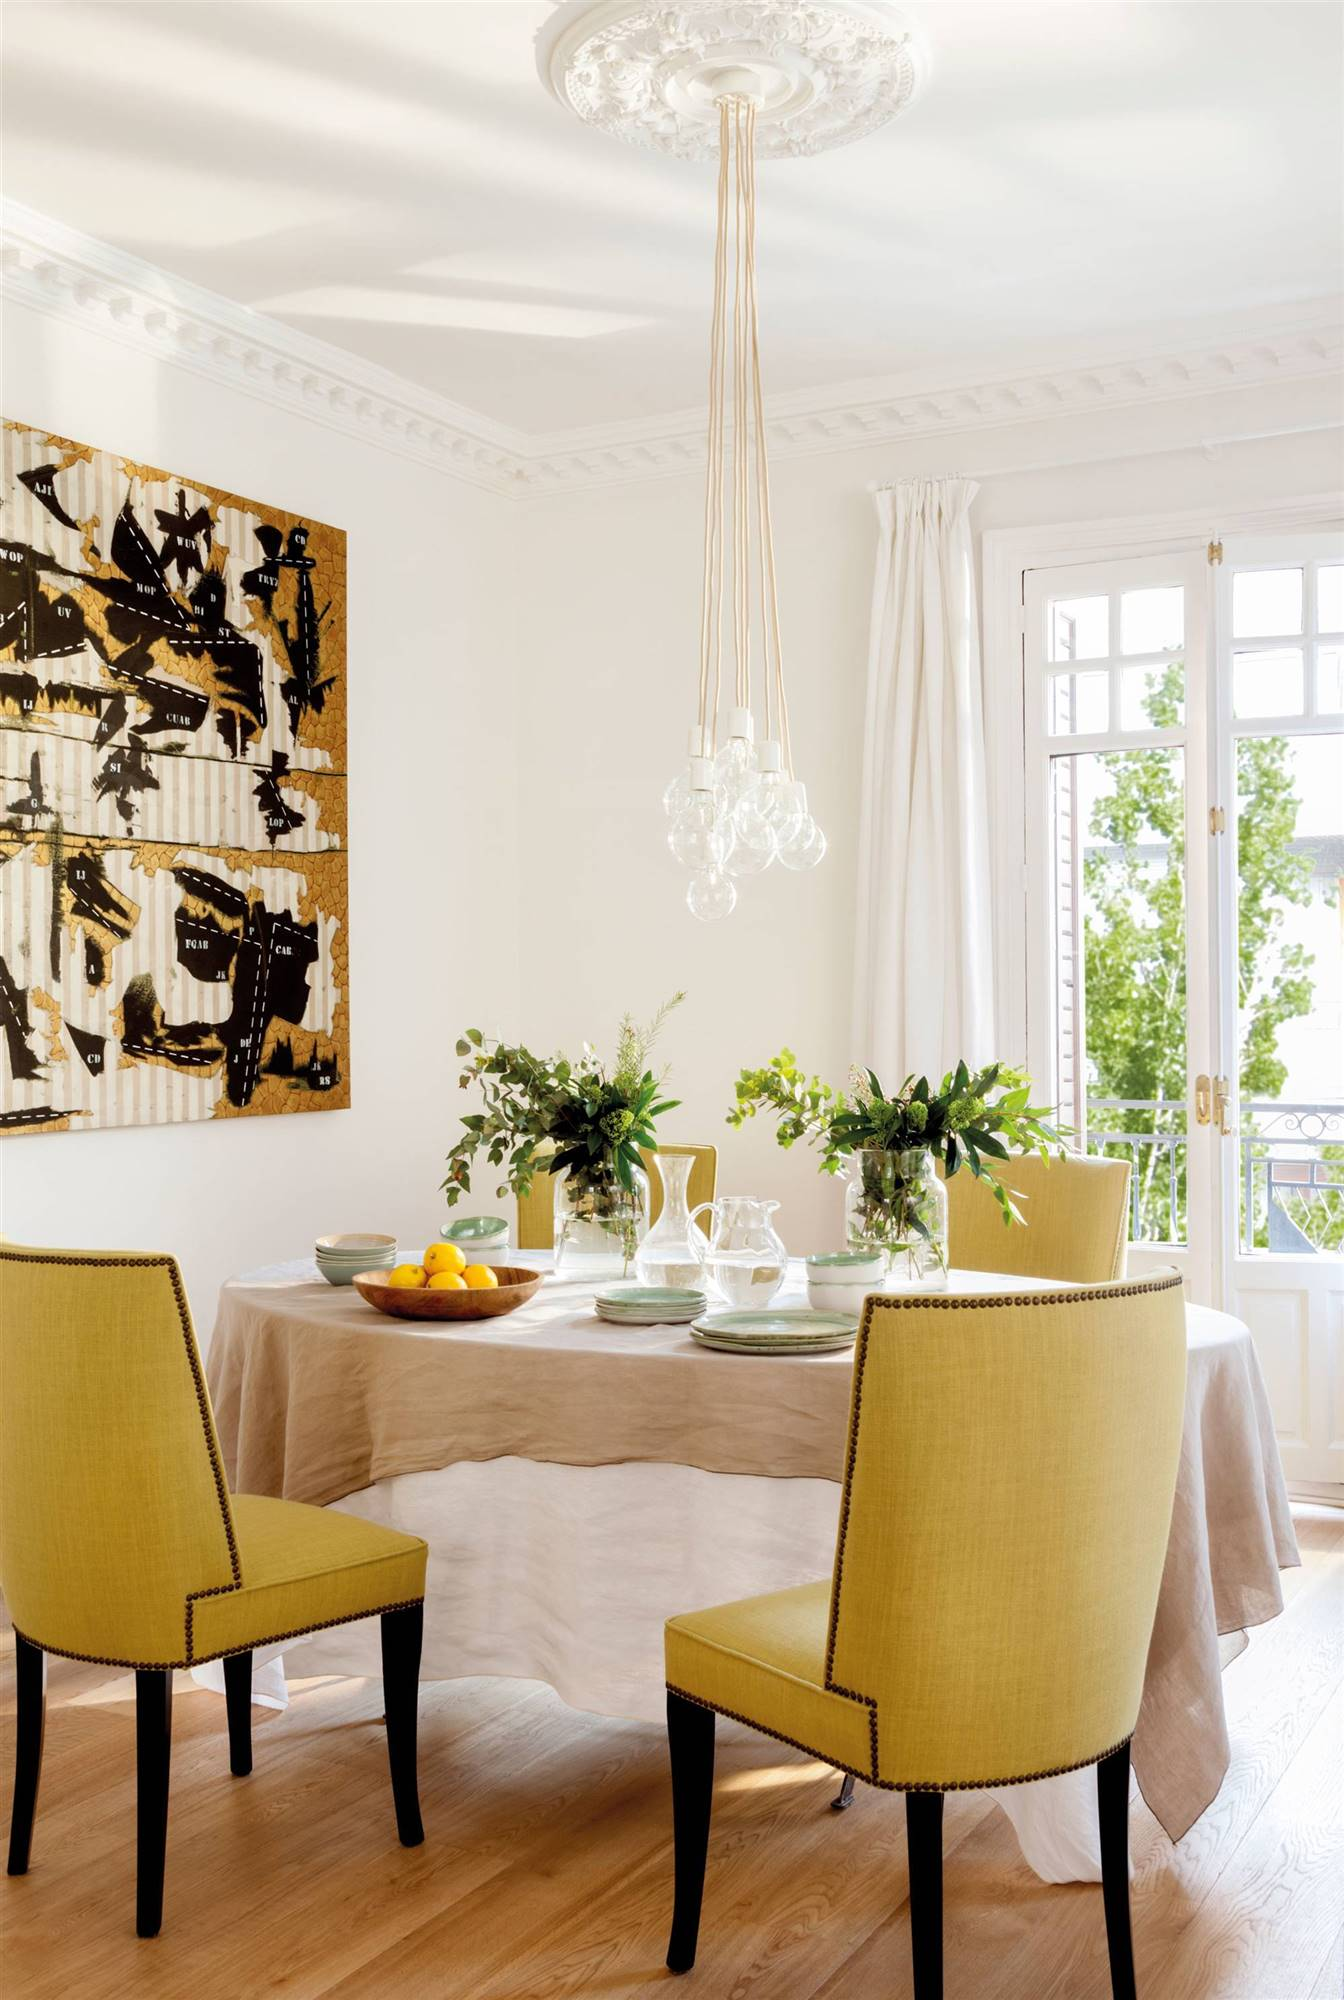 Comedores modernos for Mesa de comedor elegante lamentable